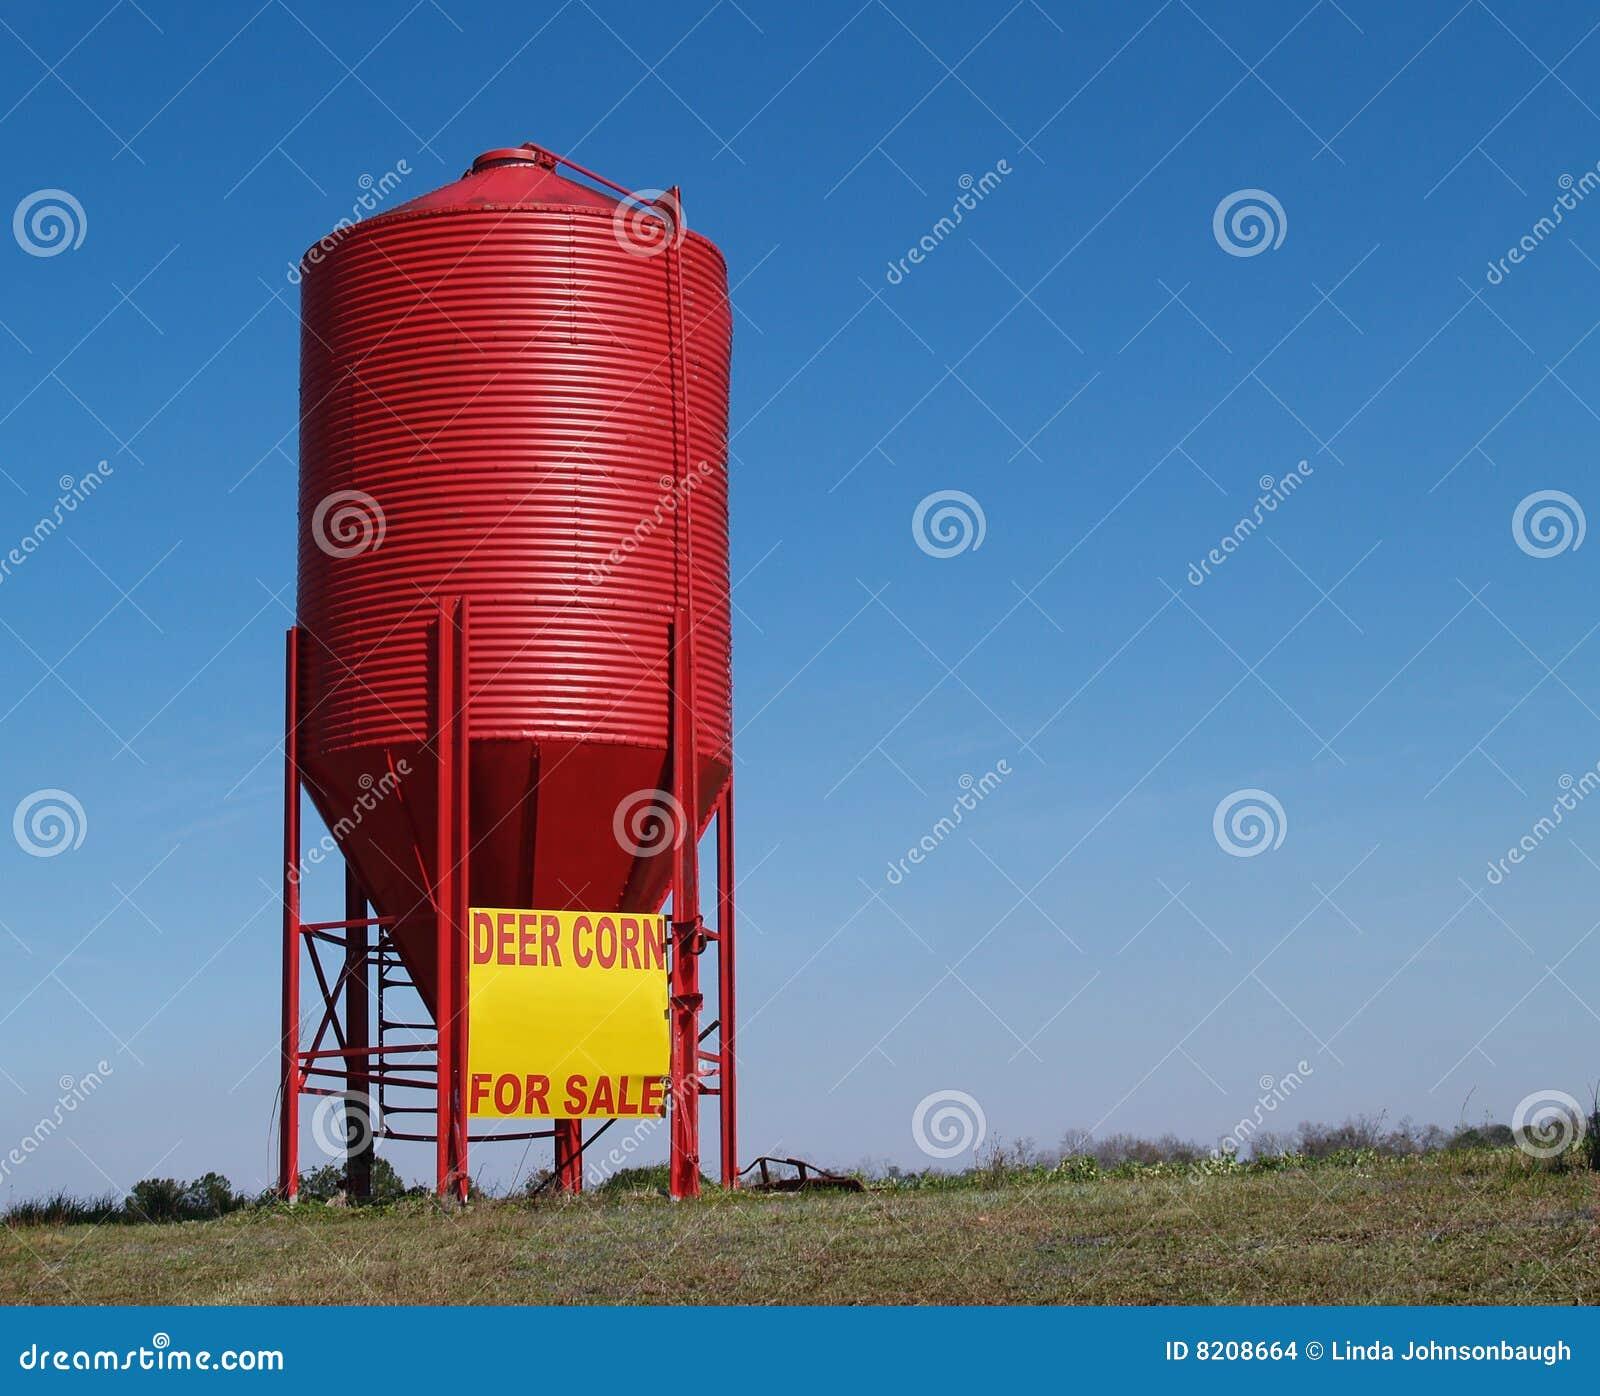 small red grain silo stock photo image of grain merchandise 8208664. Black Bedroom Furniture Sets. Home Design Ideas